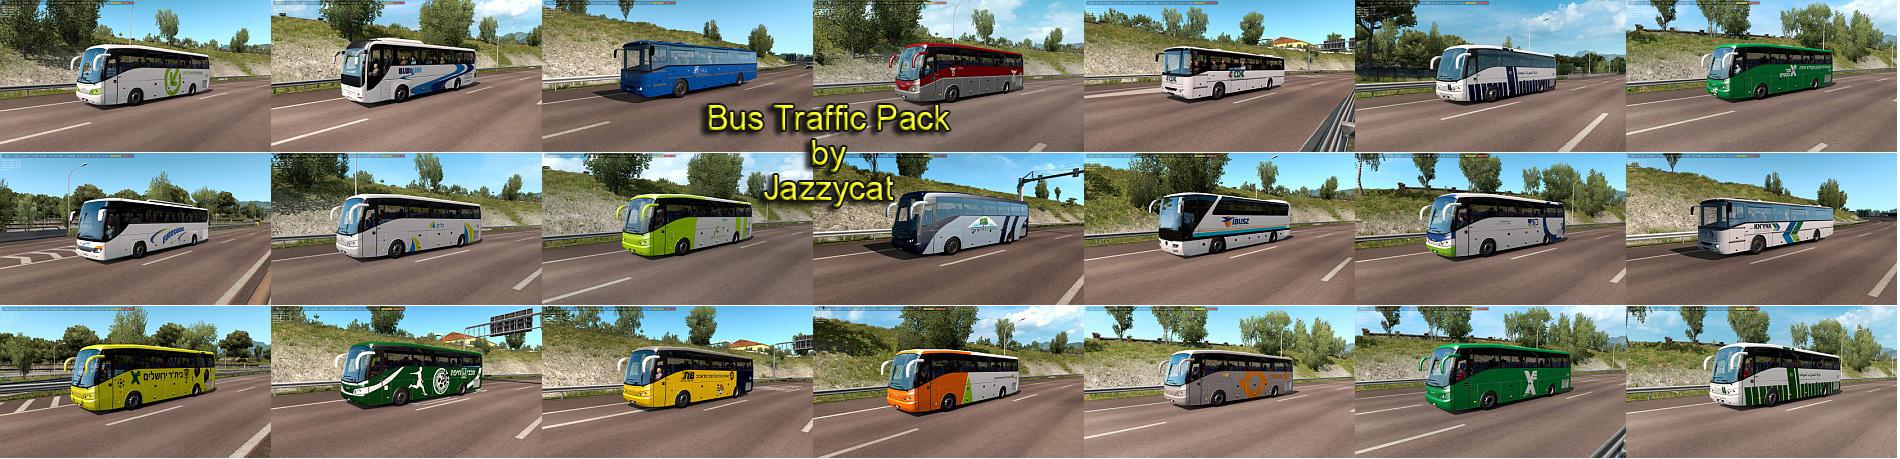 [Obrazek: bus74_newb4khm.jpg]